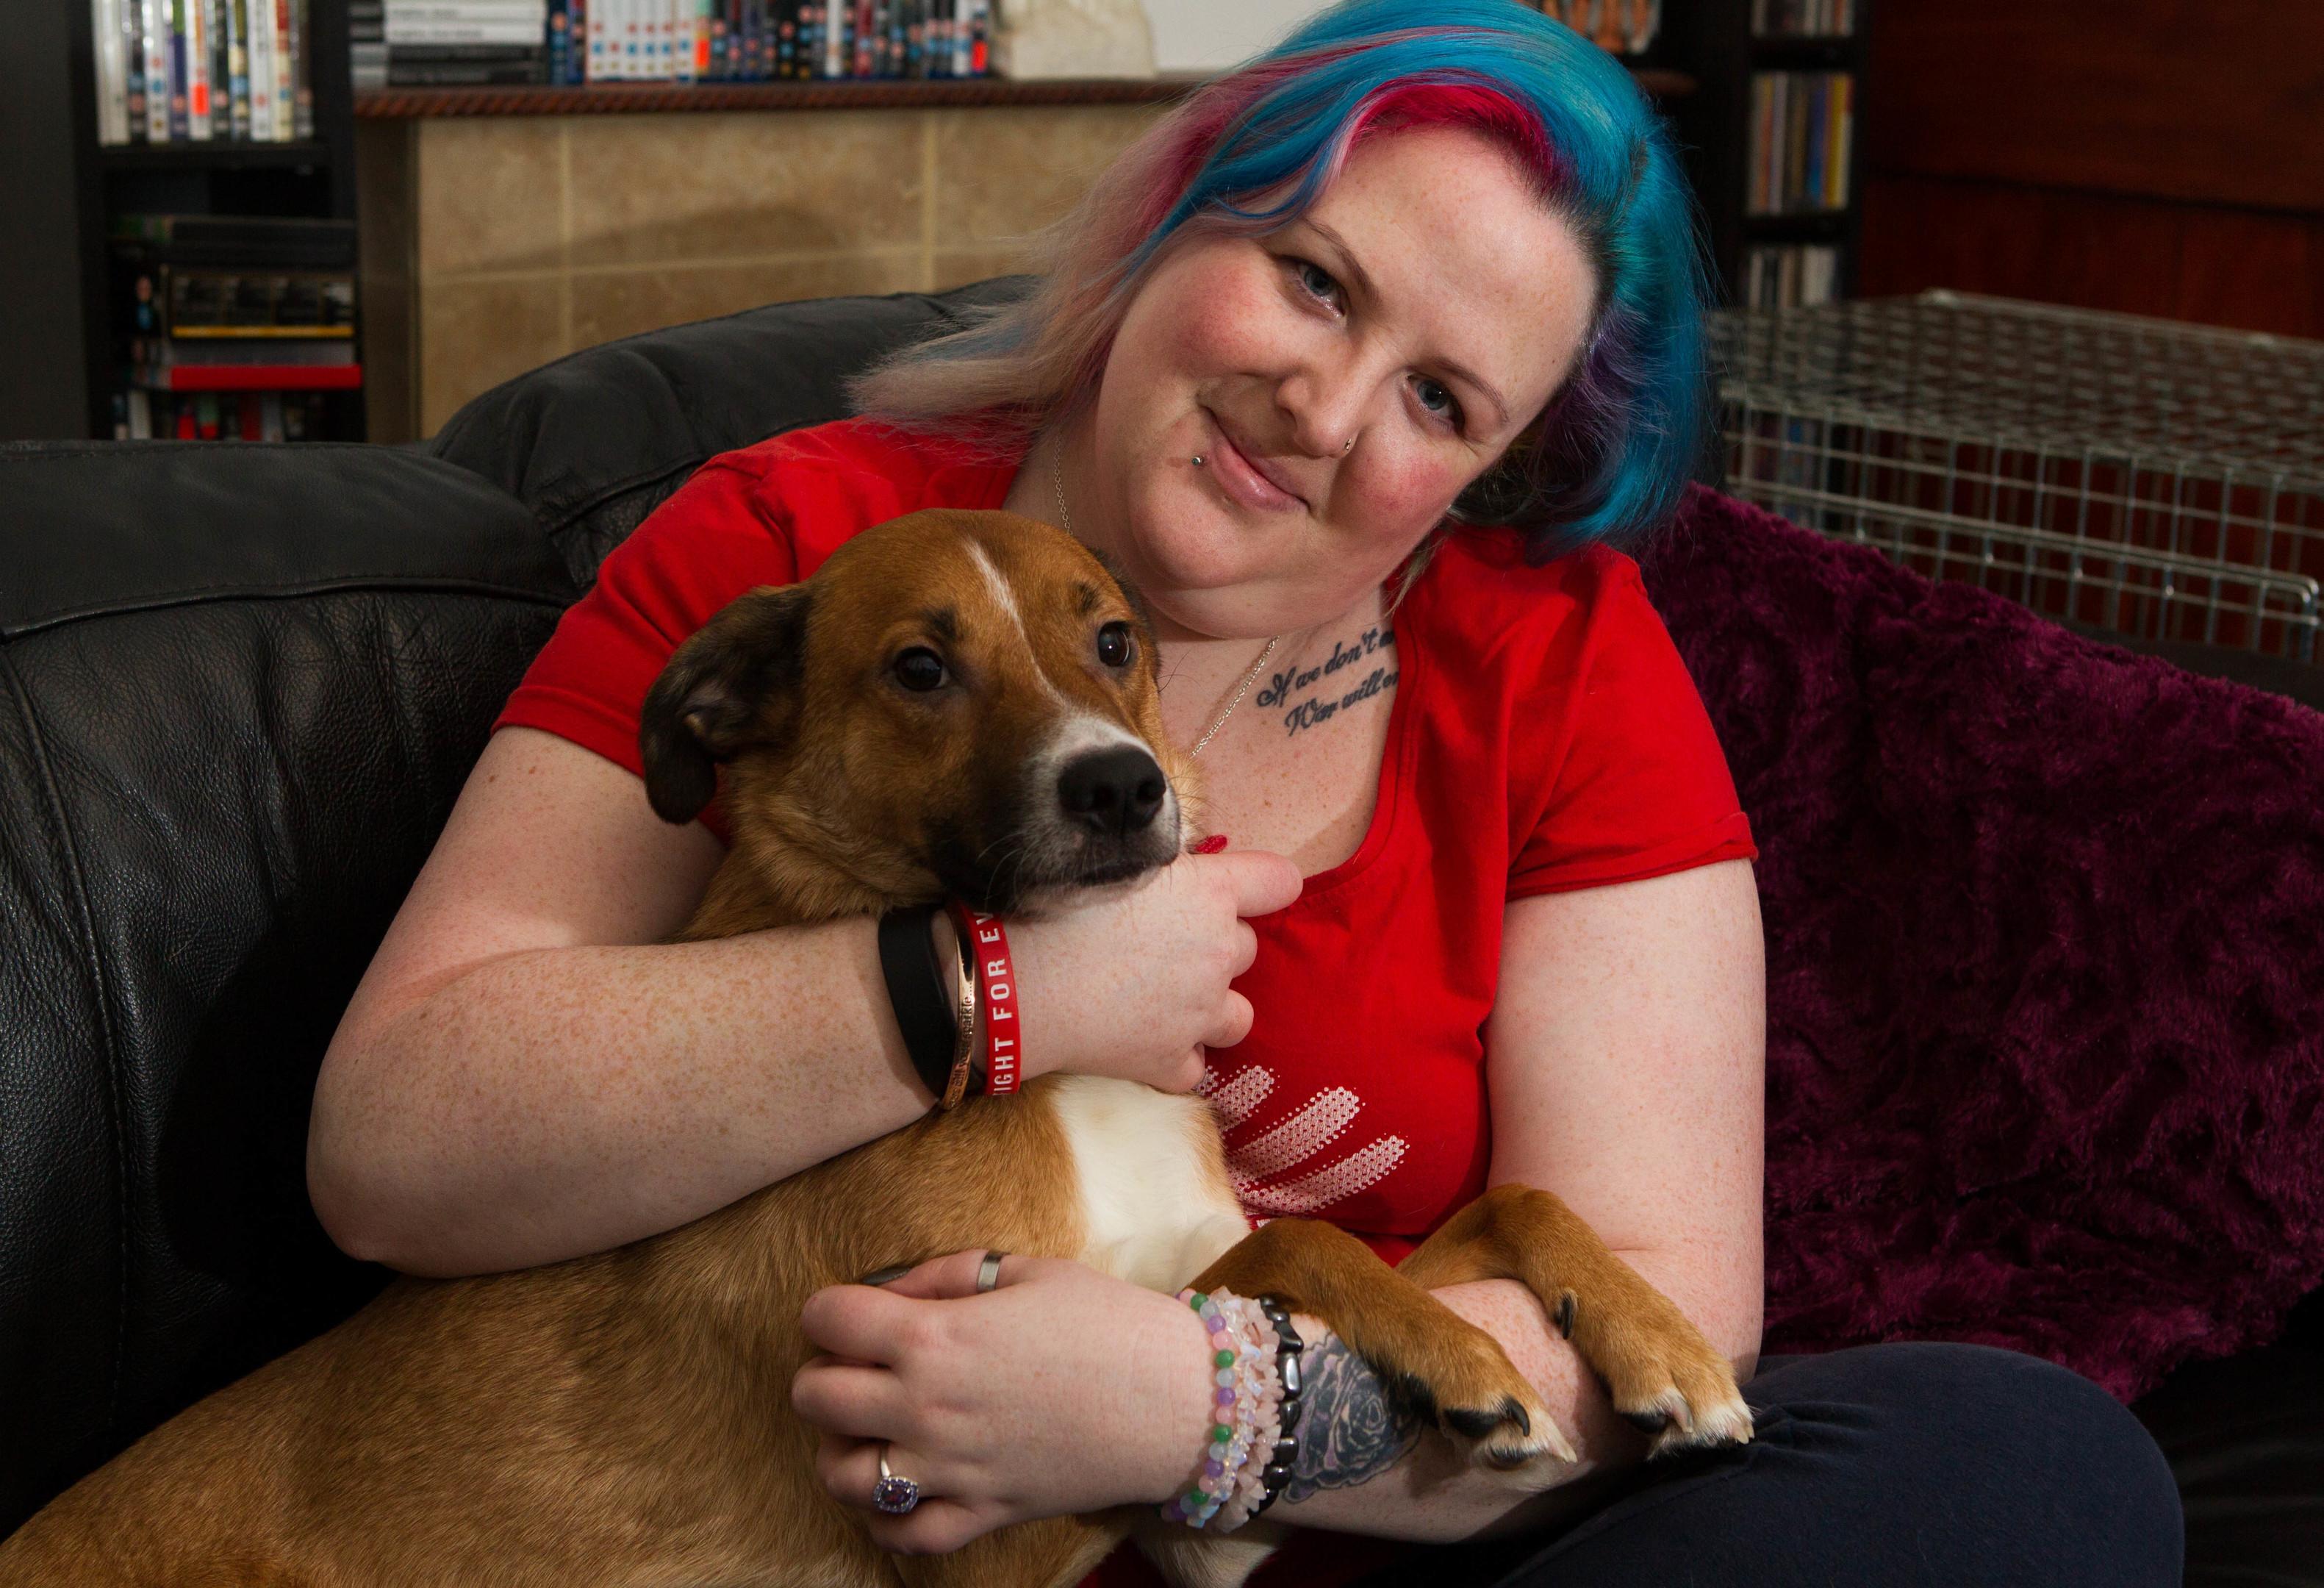 Pamela Spence and her dog Beau (Chris Austin / DC Thomson)